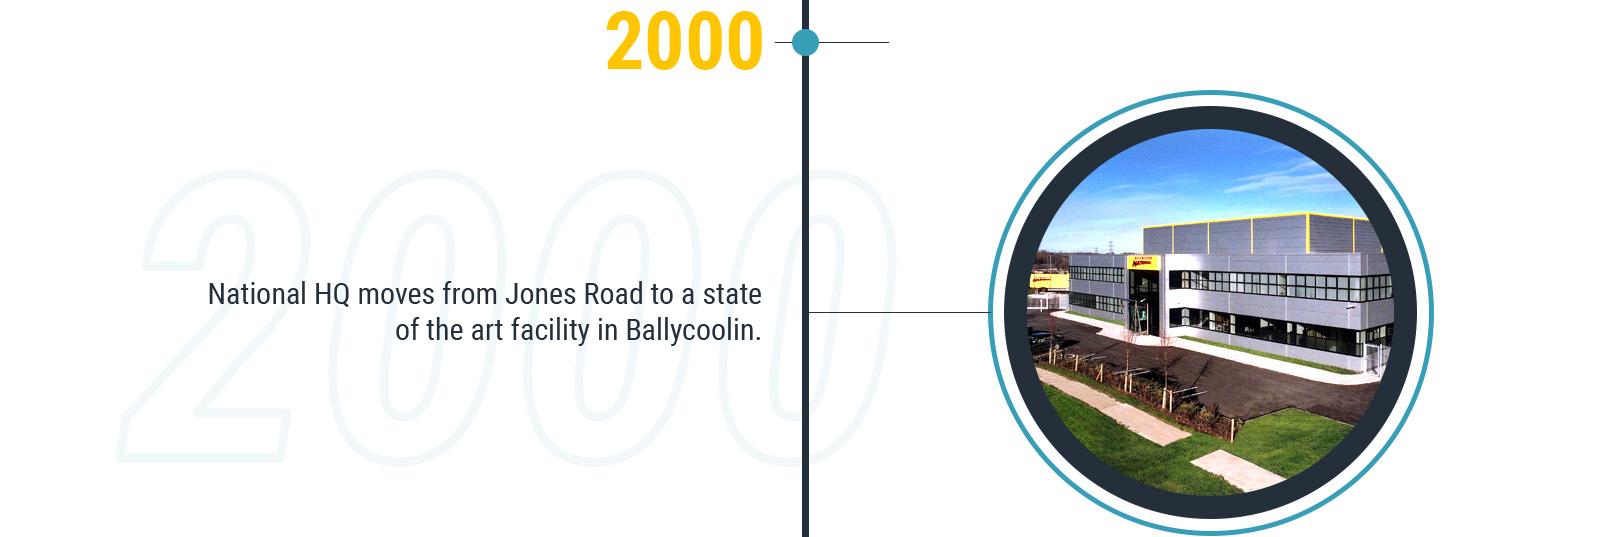 2000 History Image